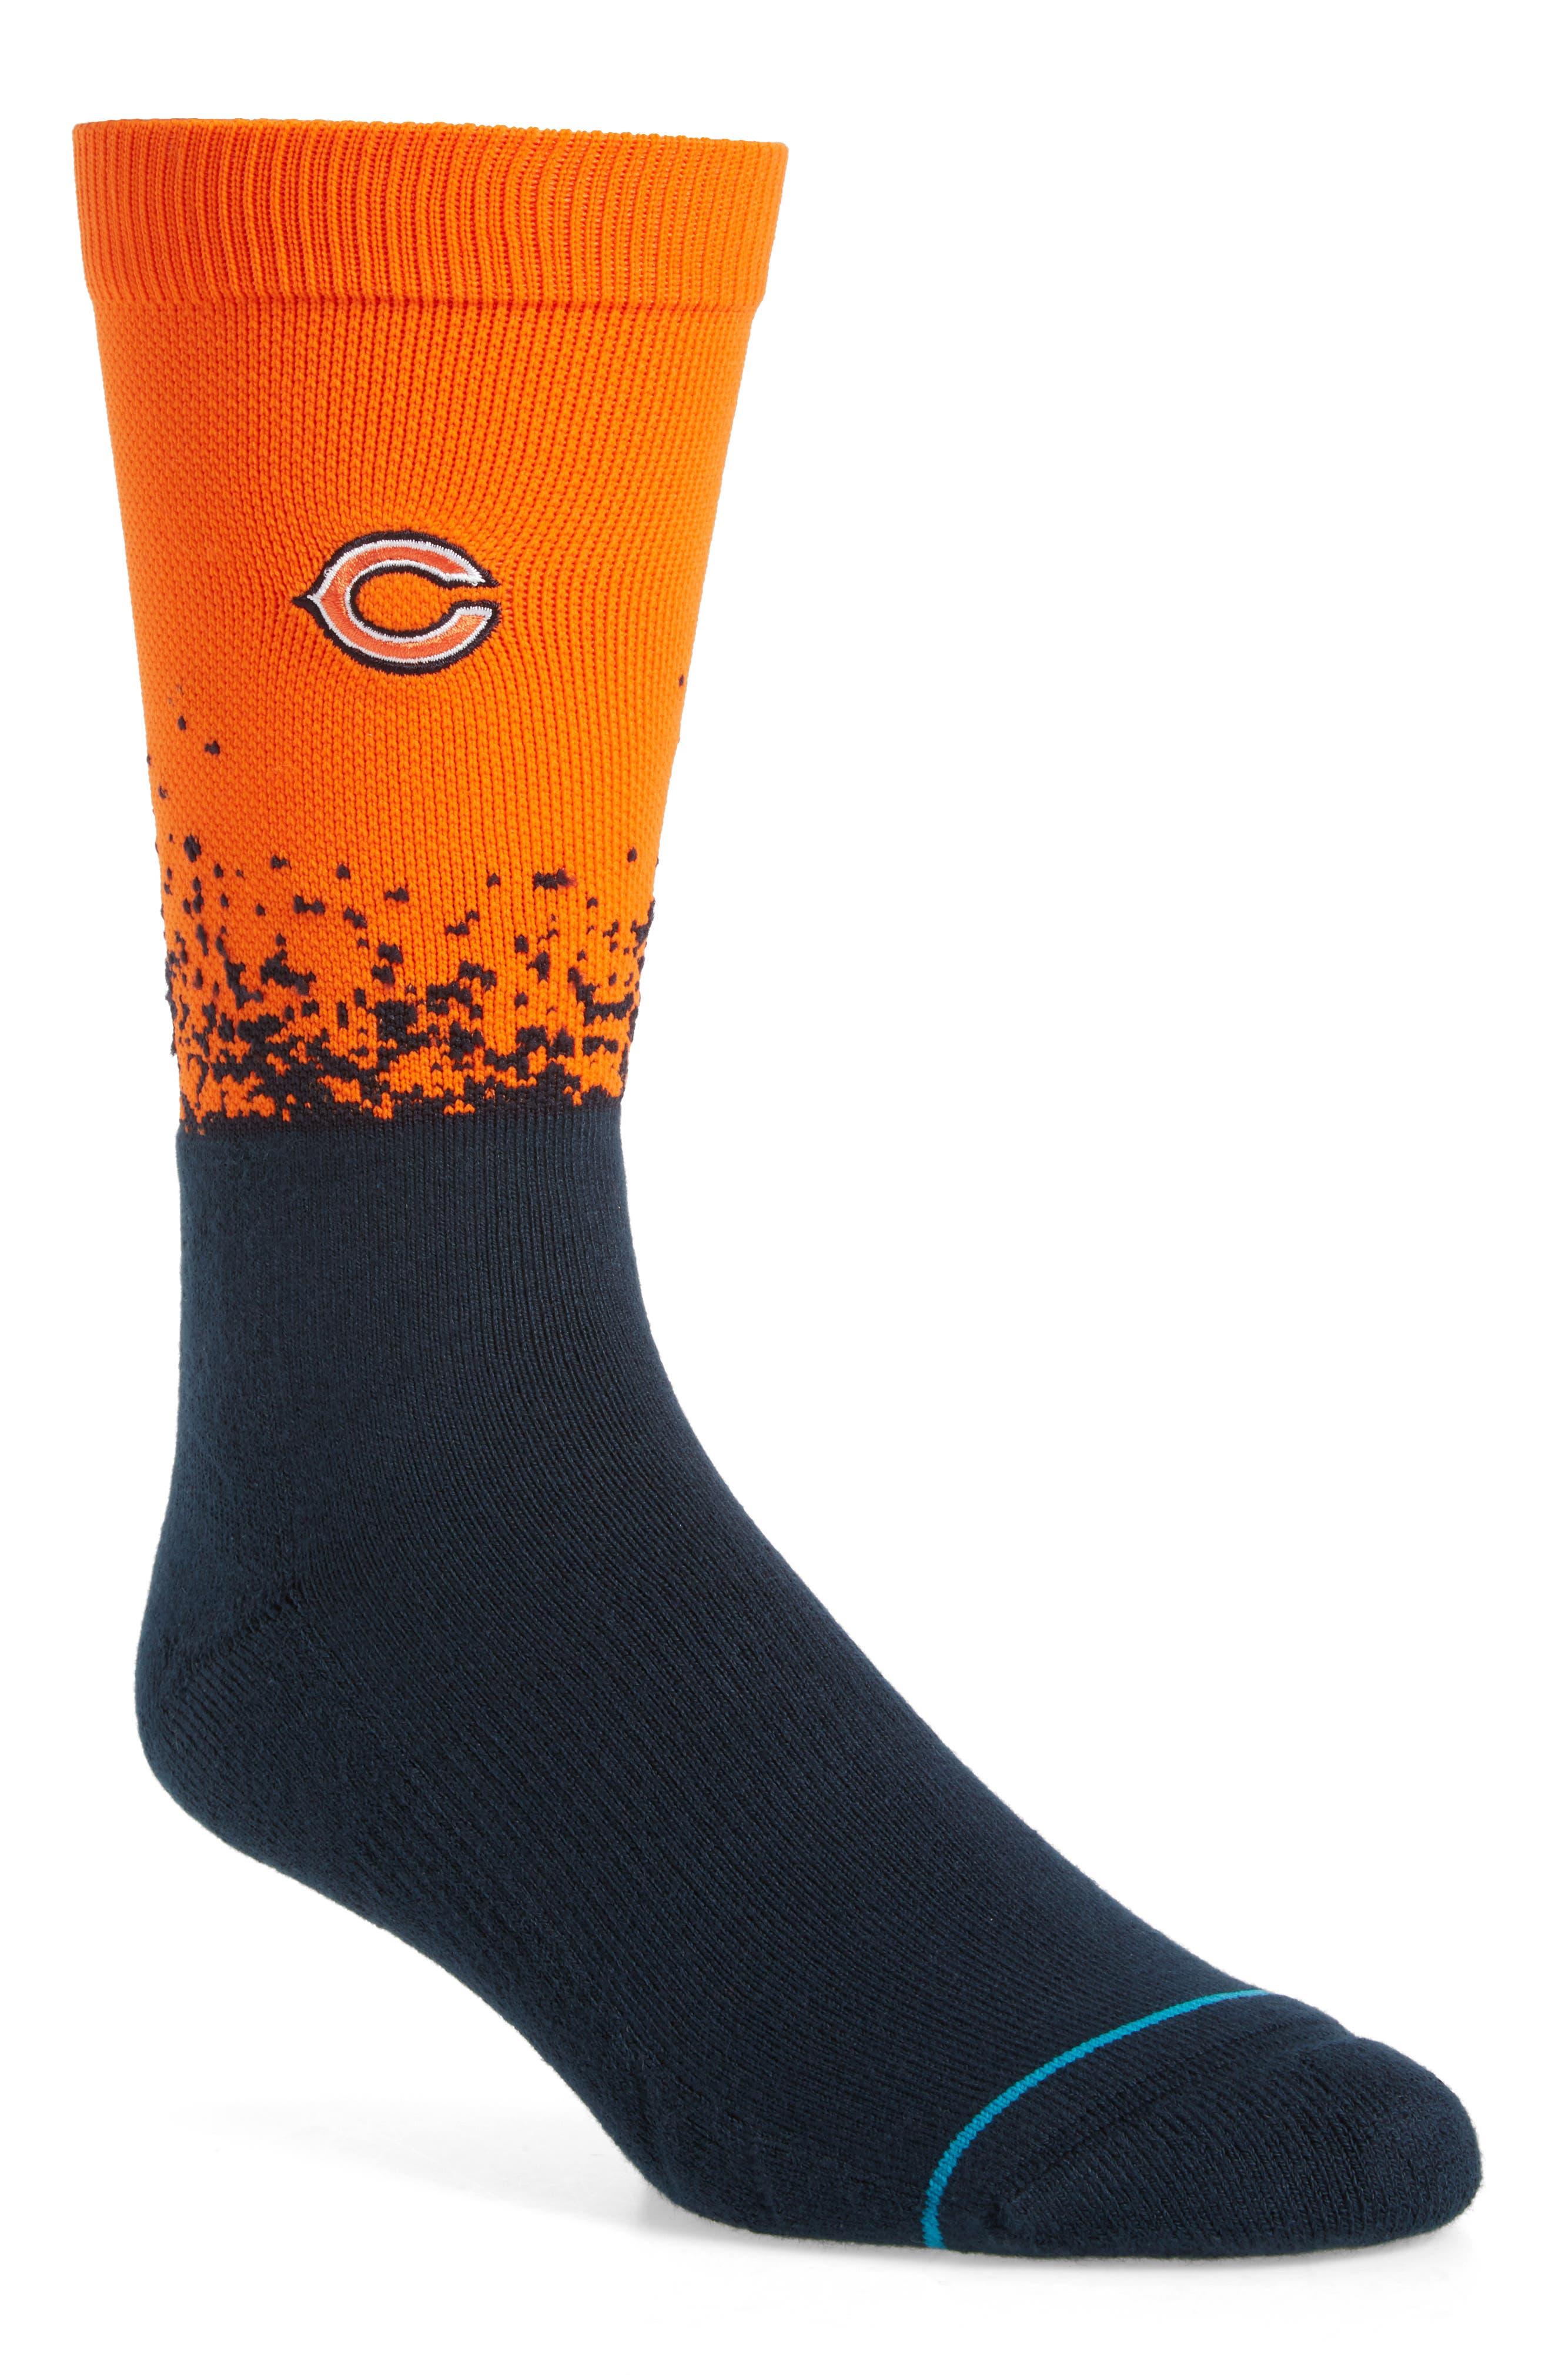 Chicago Bears - Fade Socks,                             Main thumbnail 1, color,                             Orange